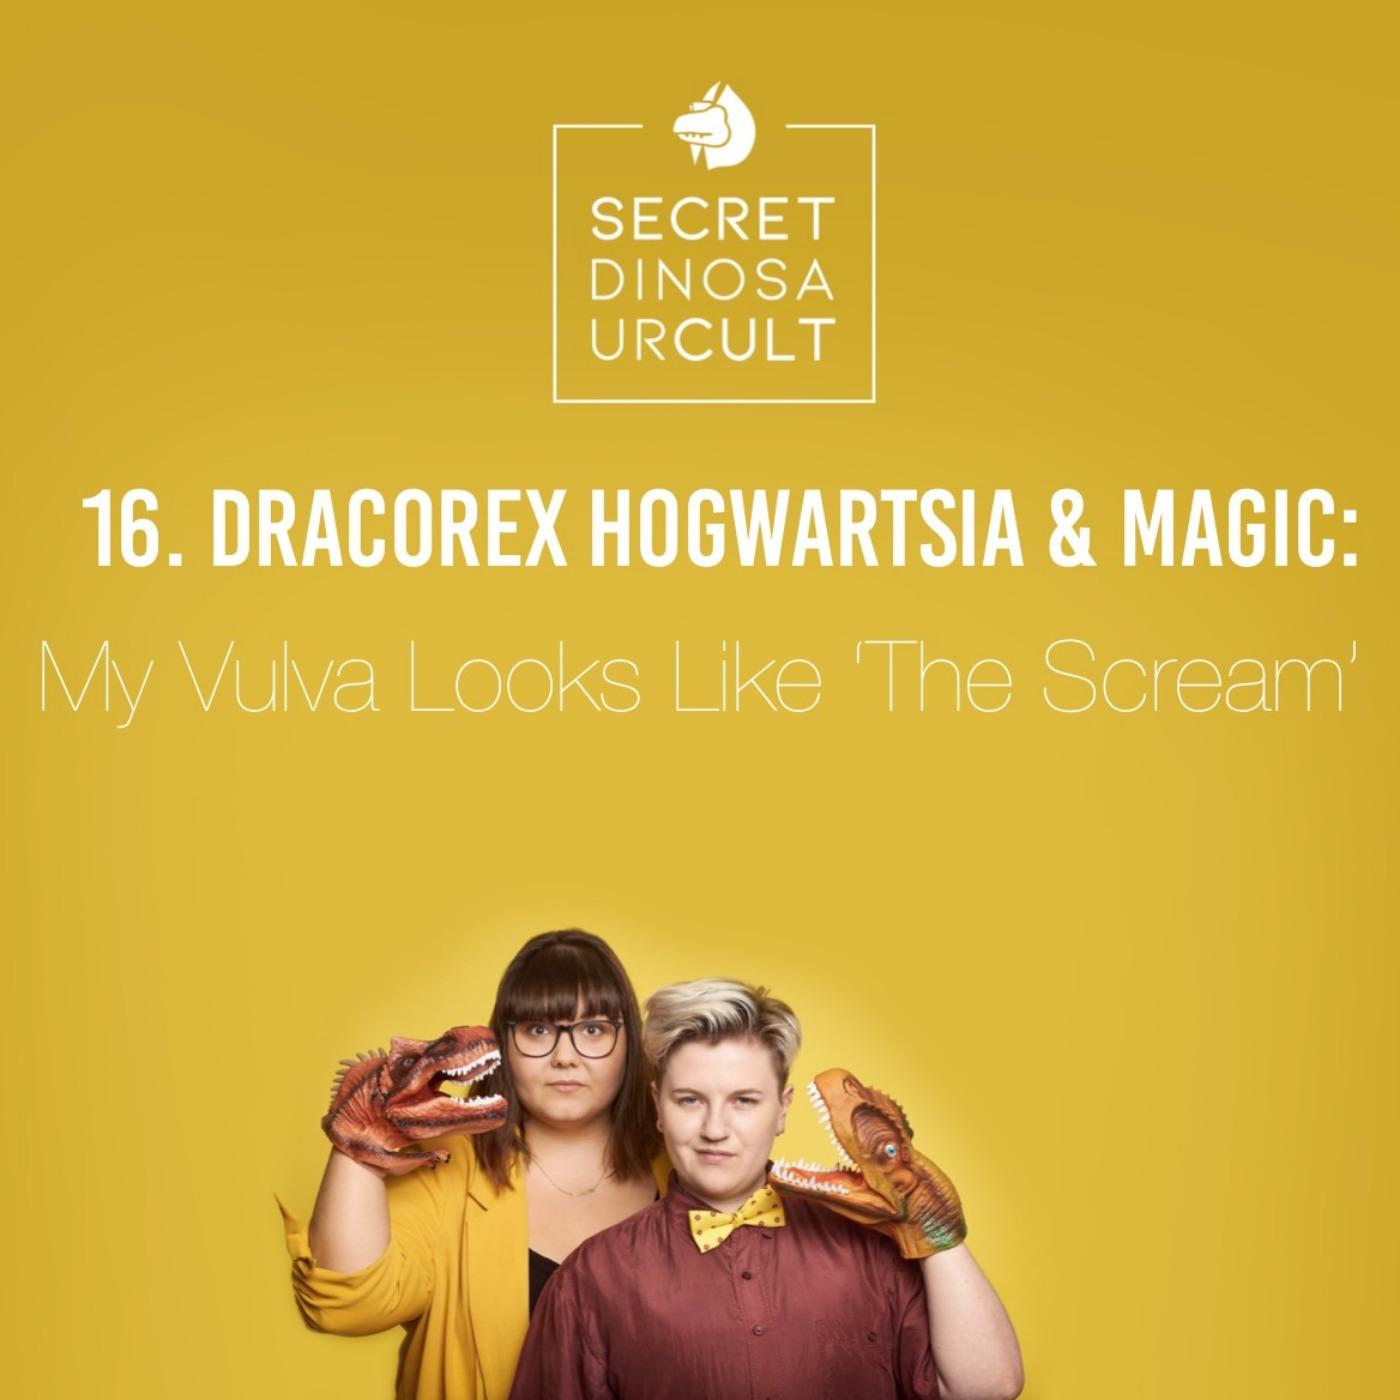 16. Dracorex Hogwartsia & Magic: My Vulva Looks Like 'The Scream'